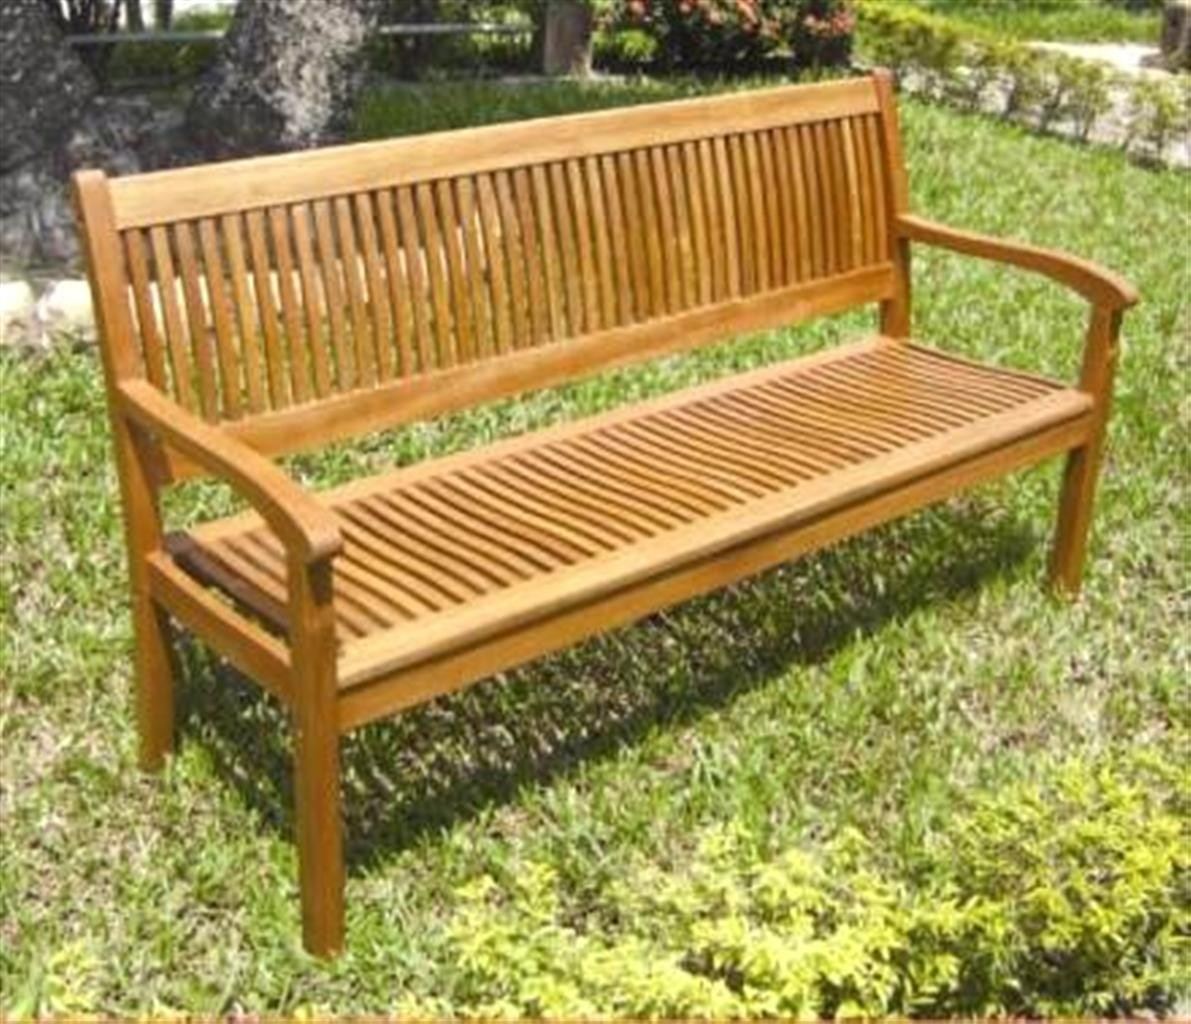 Panchina legno balau 3 posti lamacchia mobili da giardino riccione - Panchine da giardino ikea ...